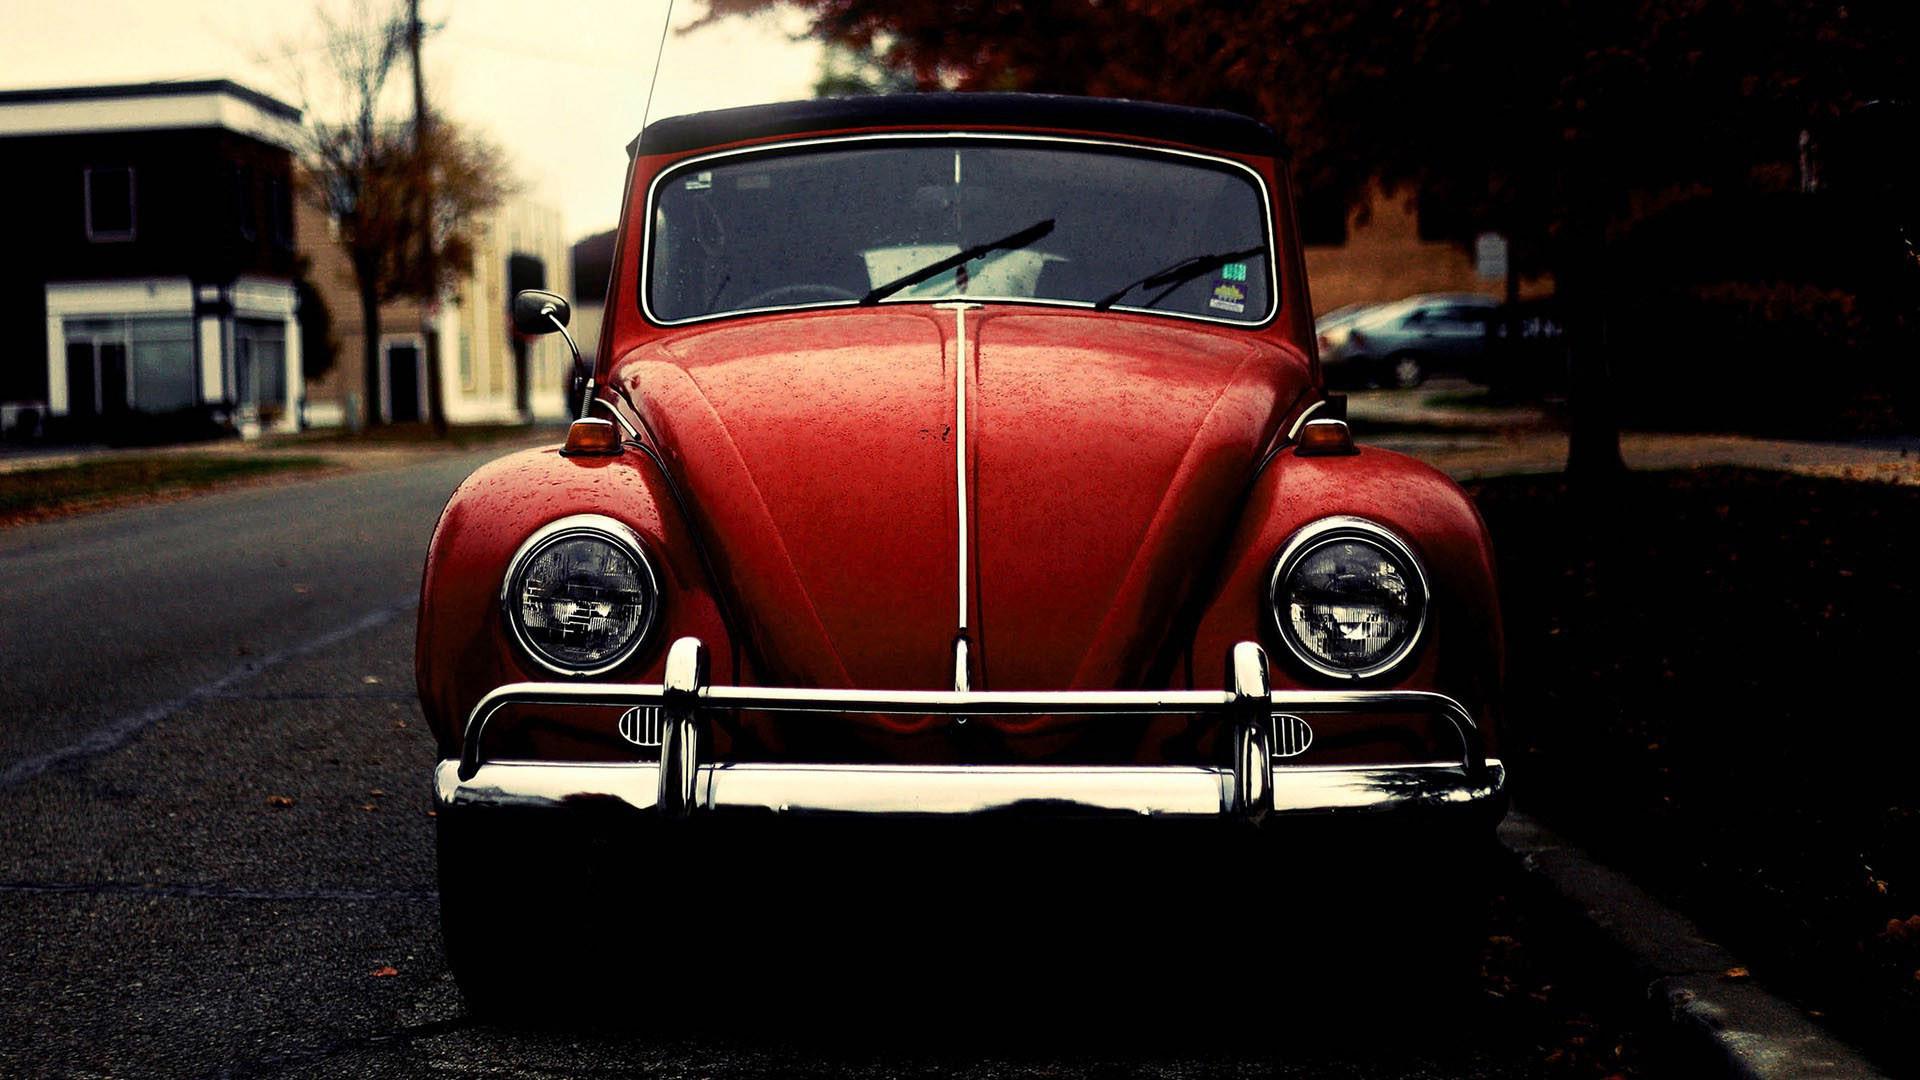 Red Car Wallpaper 69 Images